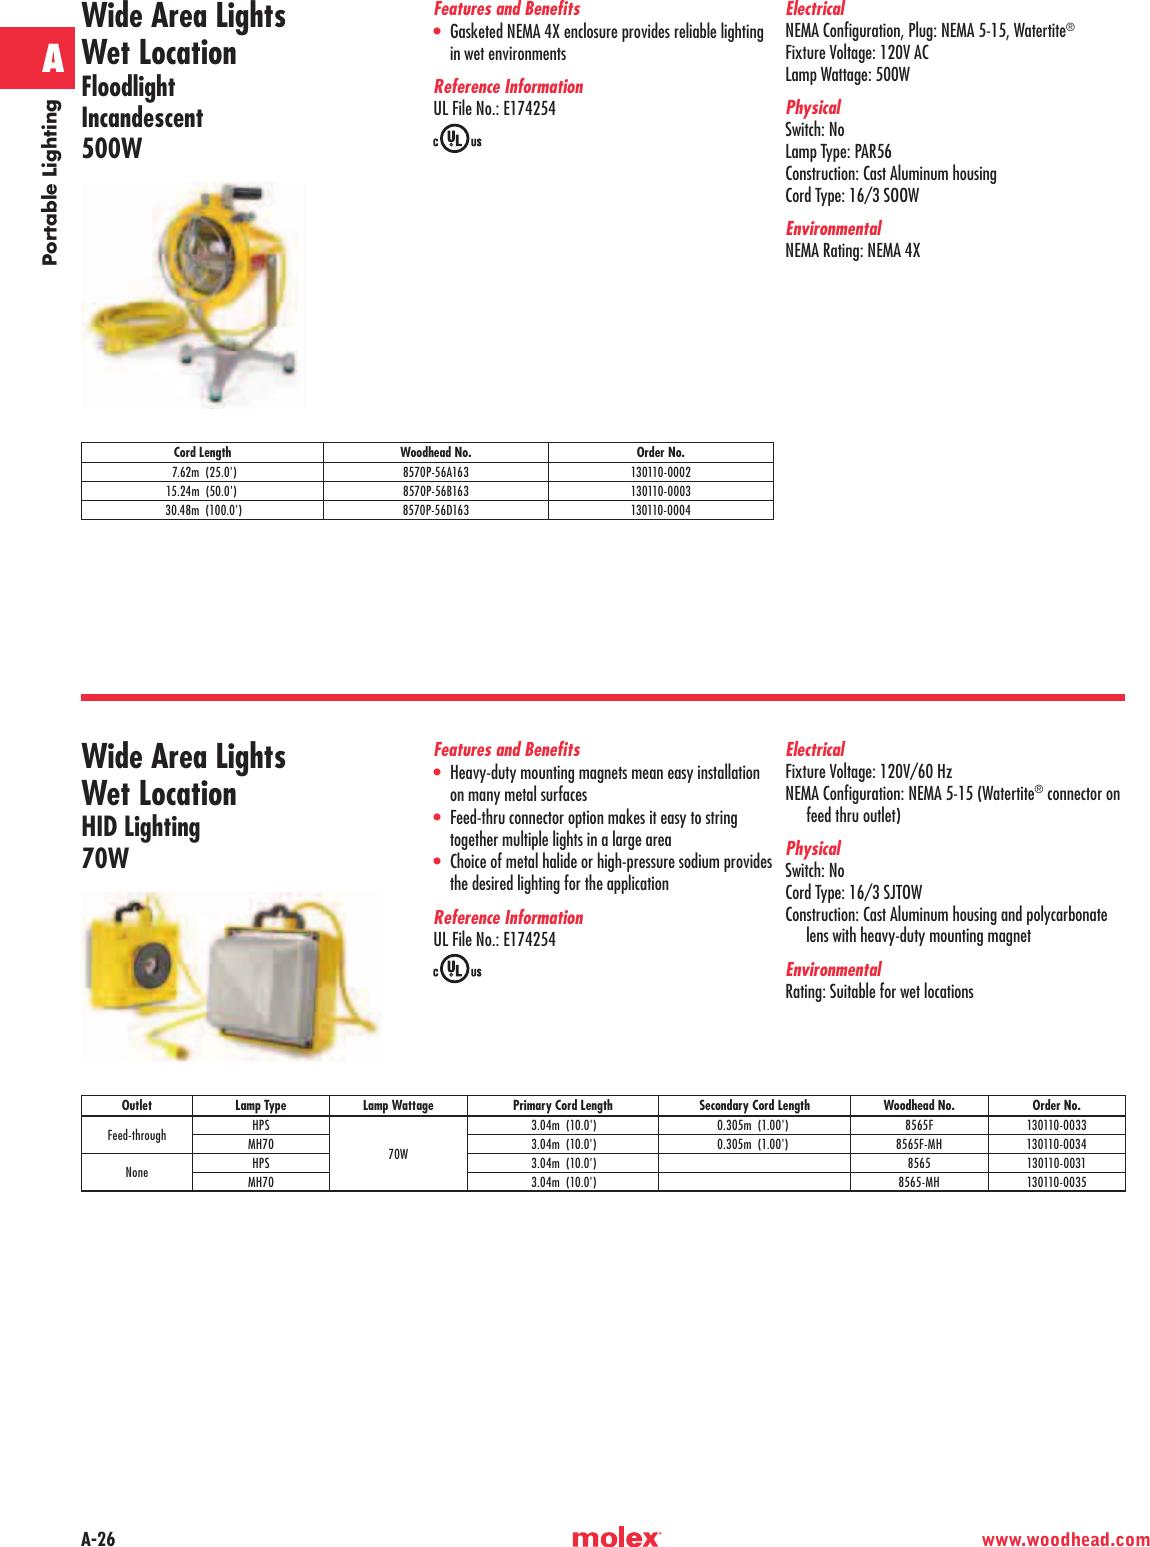 30W Lamp Wattage 50000 Candle Power 12VAC//DC Primary Fixture Voltage Woodhead 1647-12 Handlamp Workstation Transformer Type Wet Location Non-NEMA Configuration 14//2 SOOW Secondary Cord Type Low Voltage Spotlight